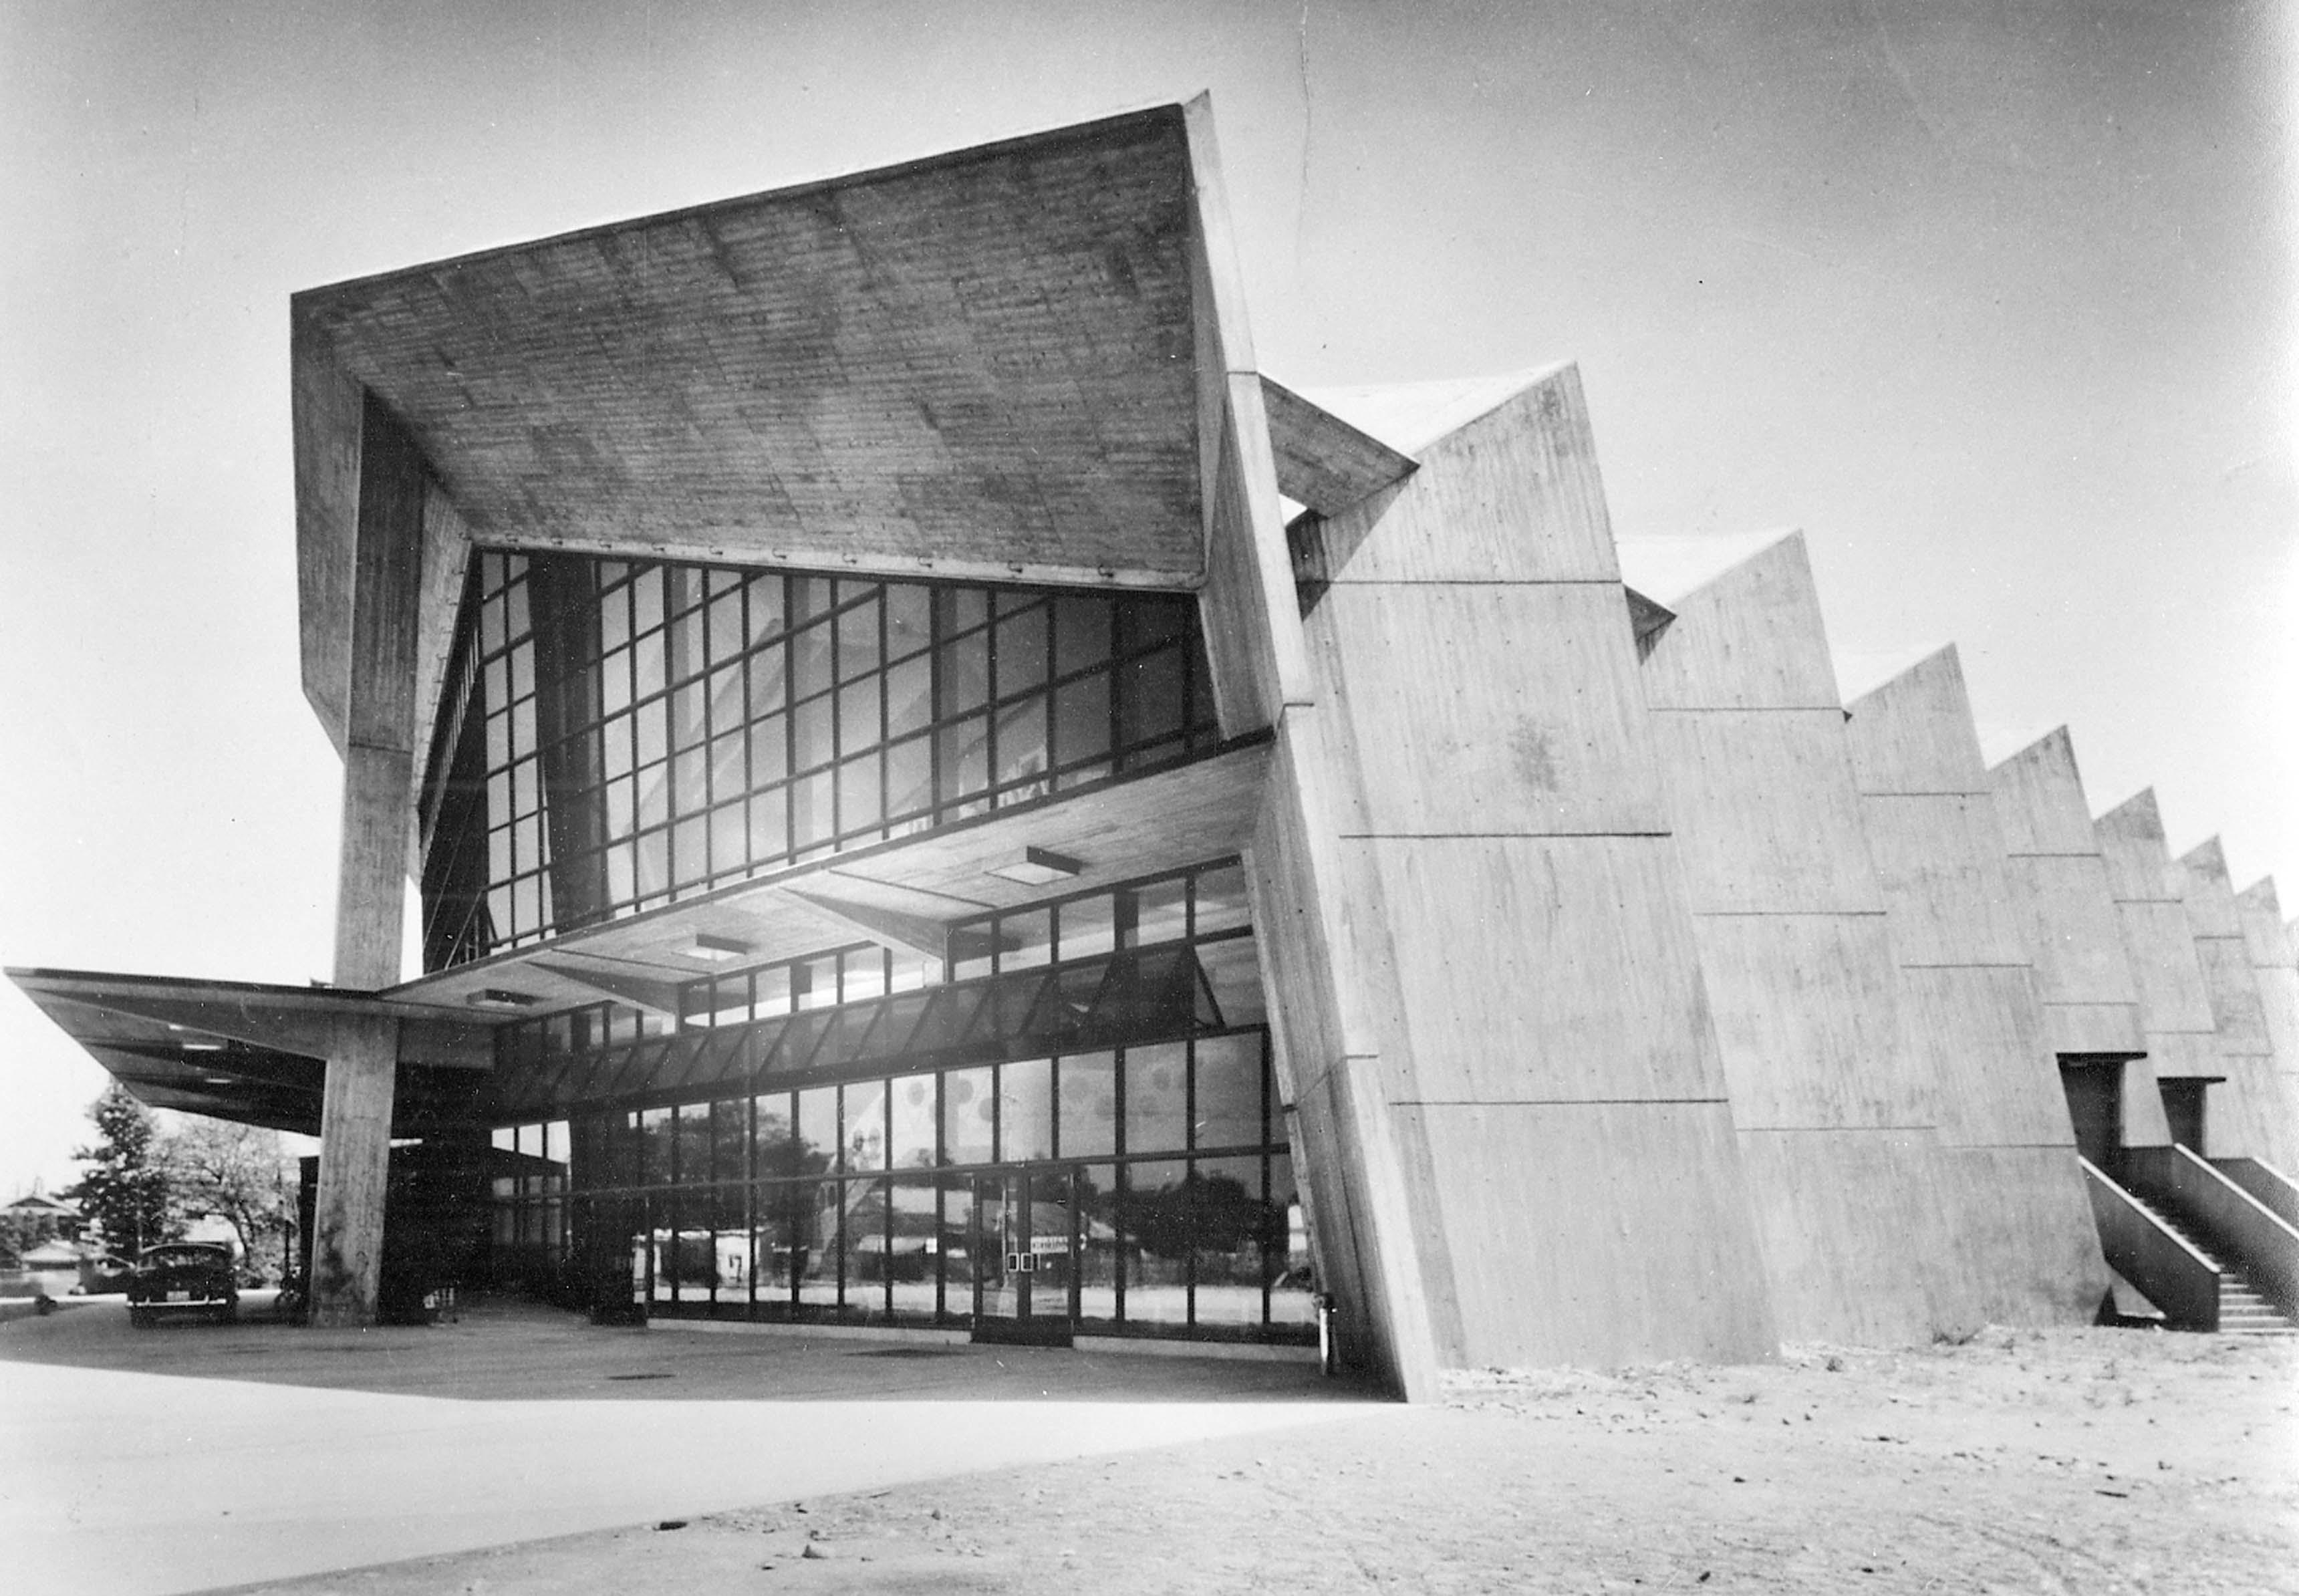 Antonin Raymond, Centre musical de la préfecture de Gunma, Takasaki, 1961